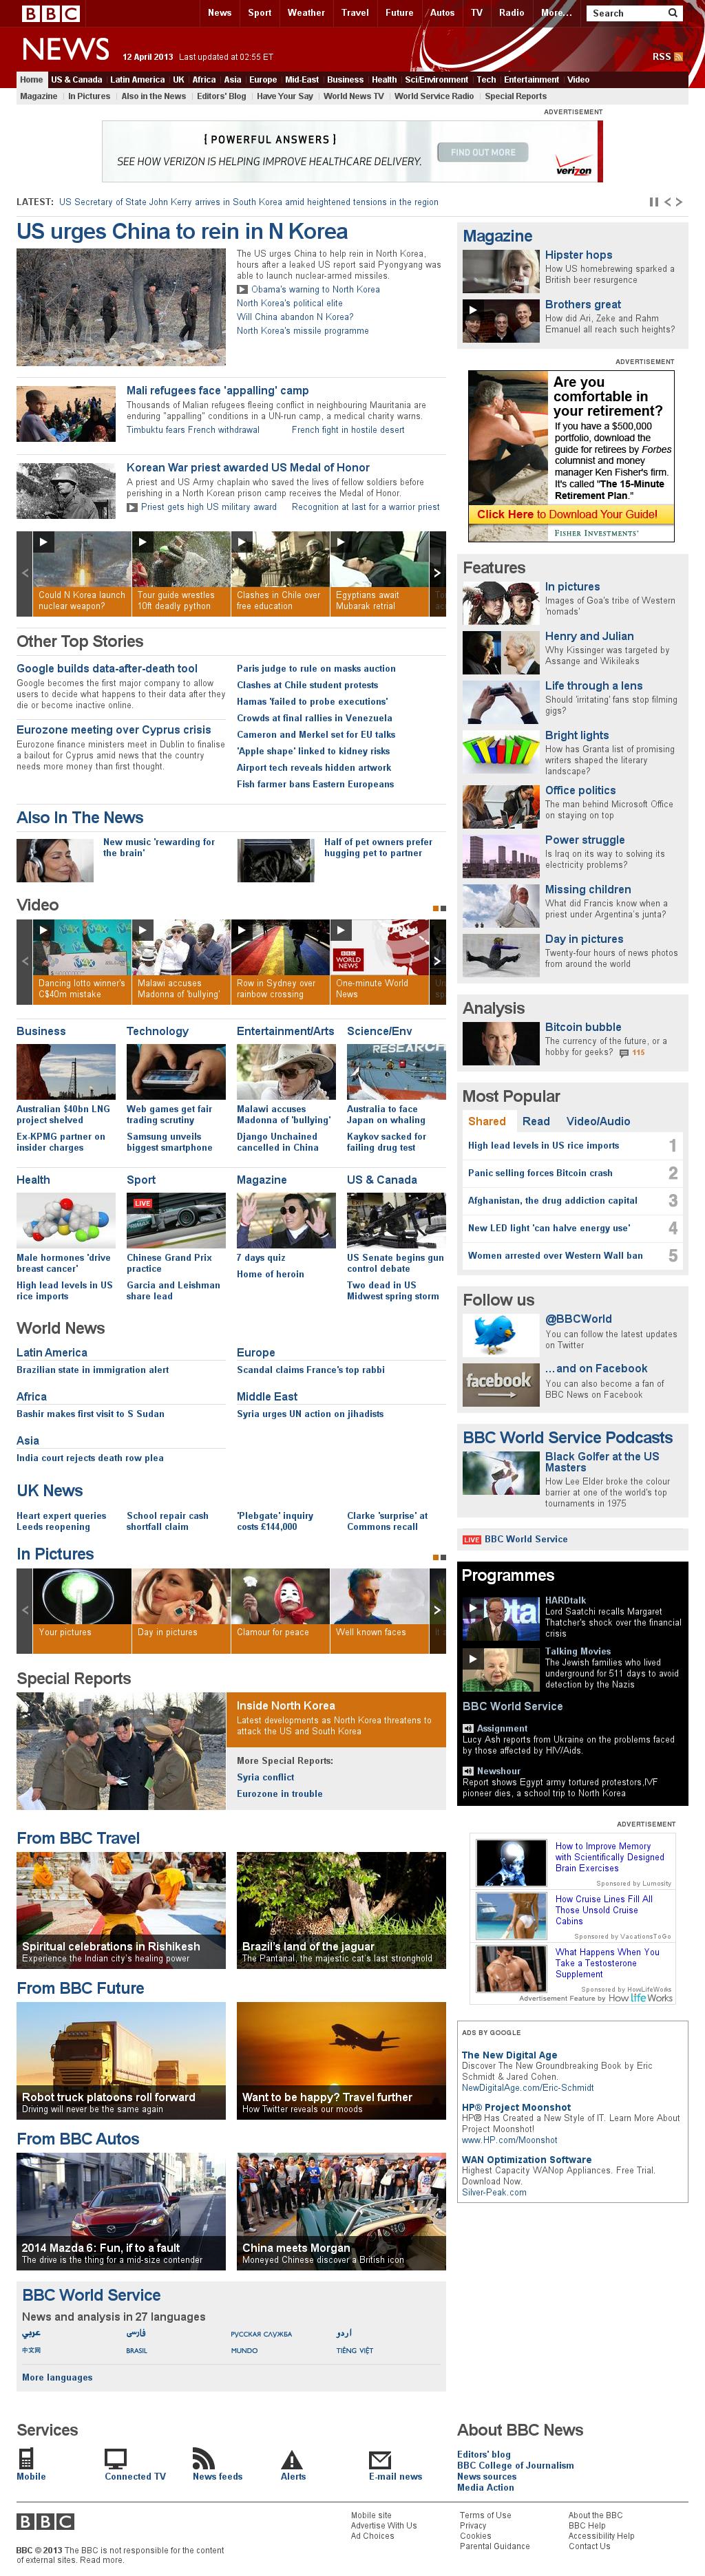 BBC at Friday April 12, 2013, 7:01 a.m. UTC